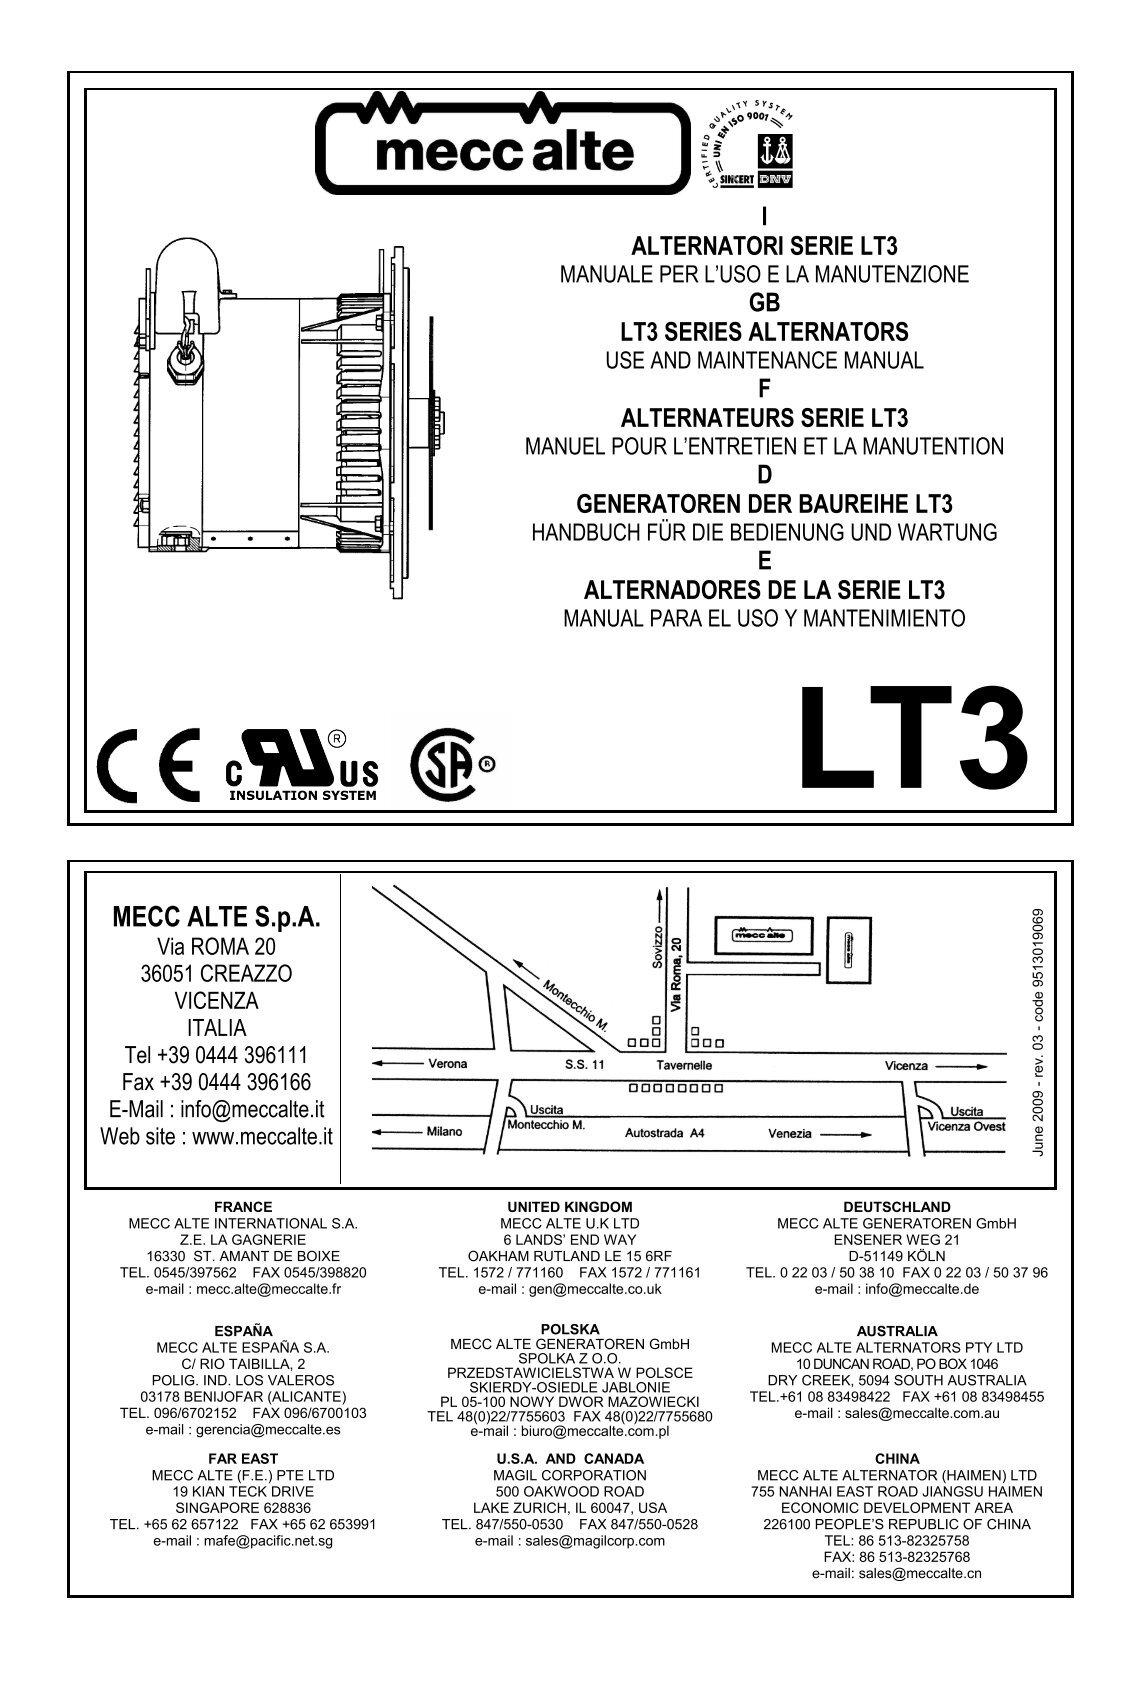 mecc alte spa wiring diagram best wiring library rh 34 ambalam org